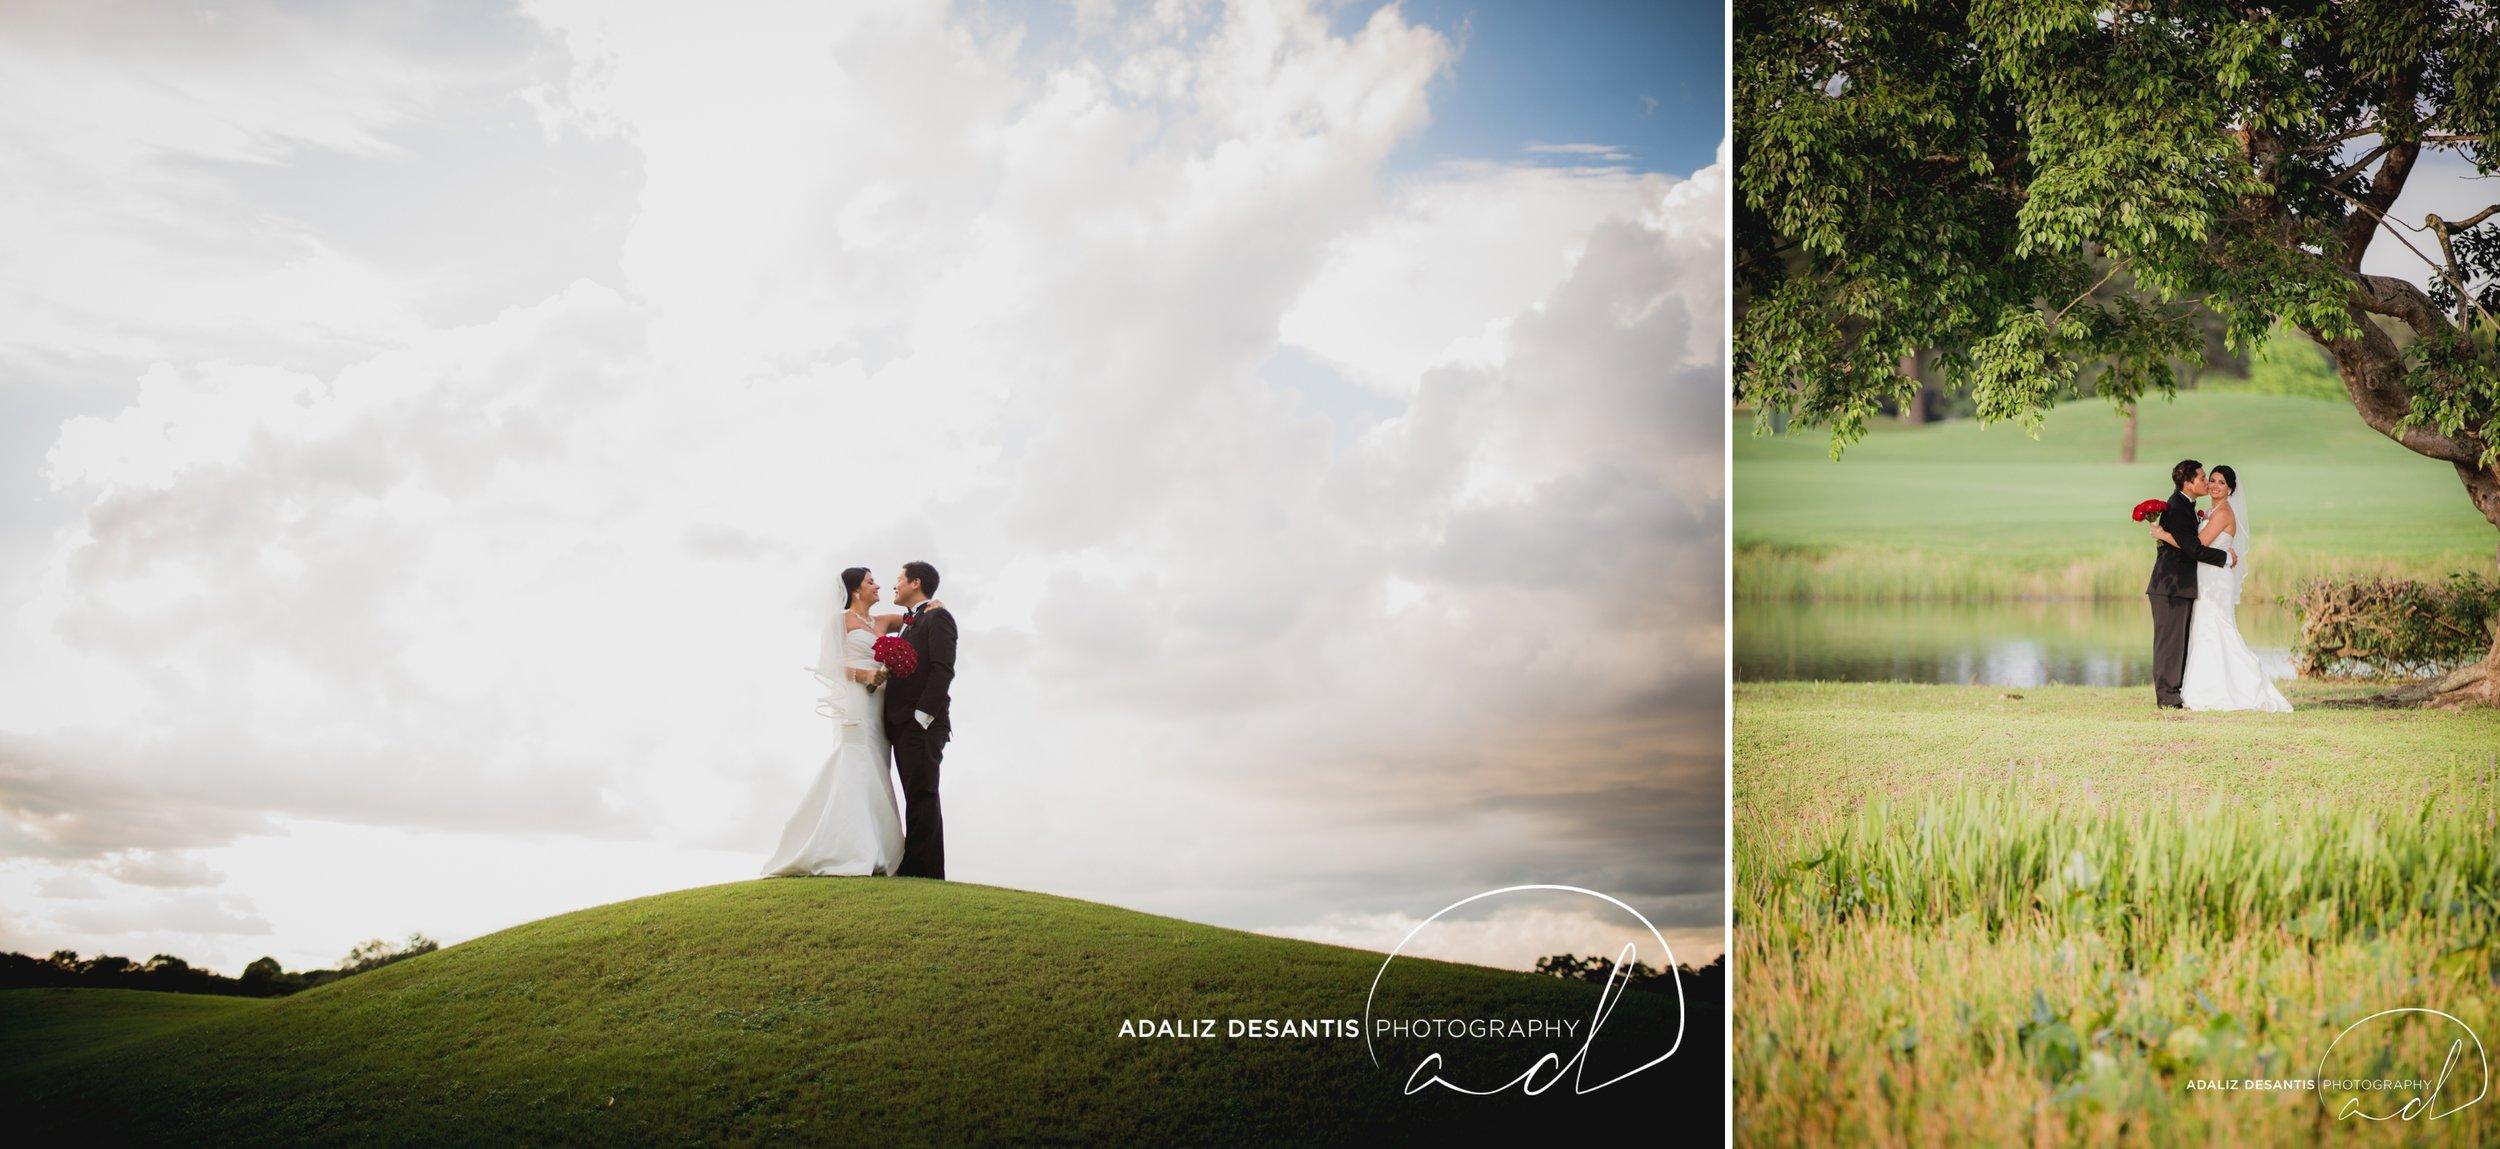 grande oaks golf club davie wedding saint david catholic church black red white south florida wedding photographer documentary photojournalistic 25.jpg